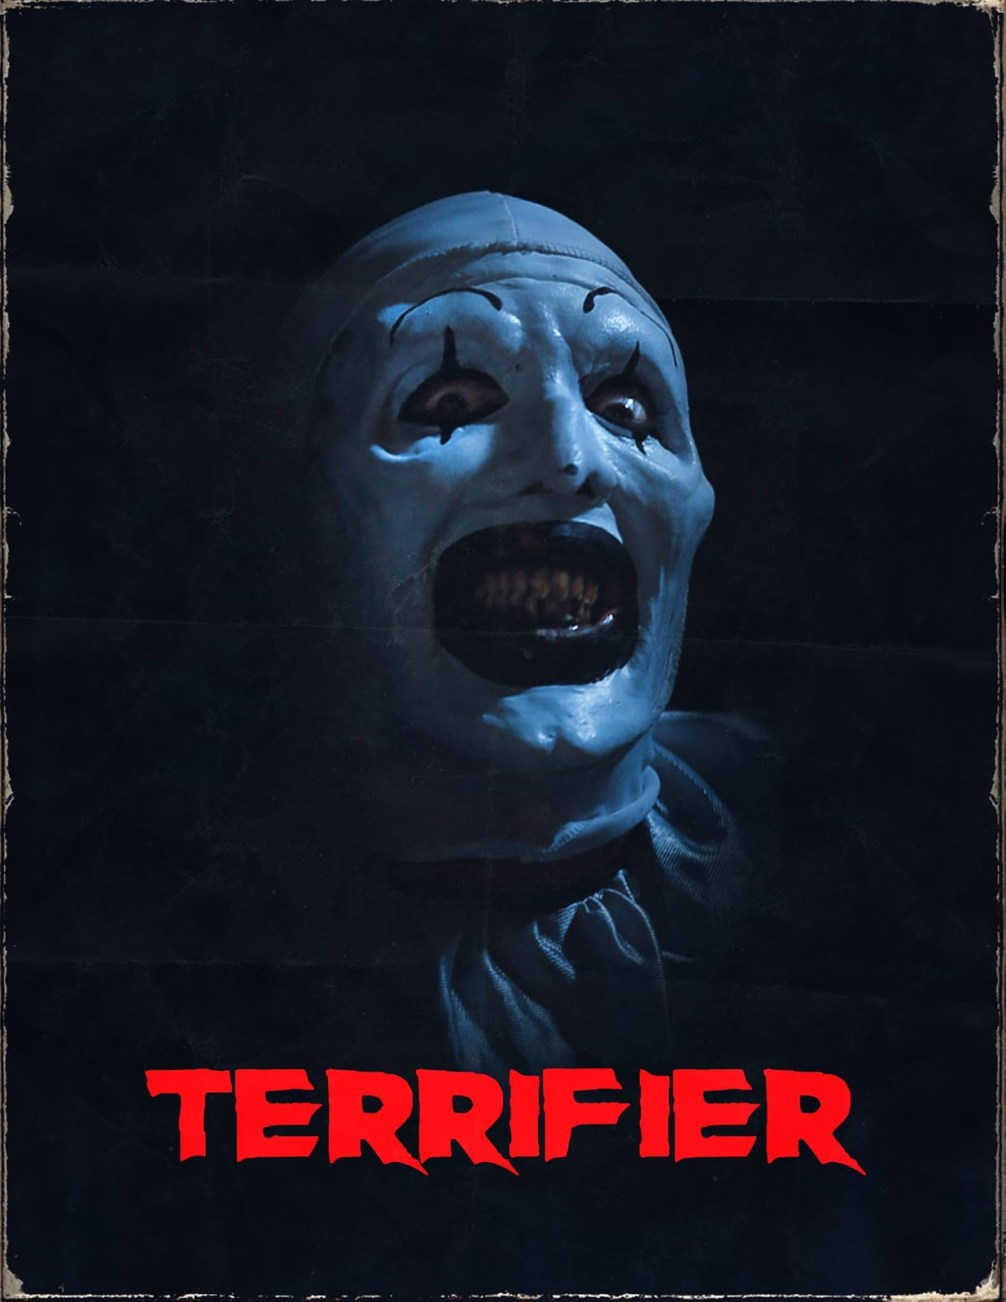 Terrifier (2015) poster